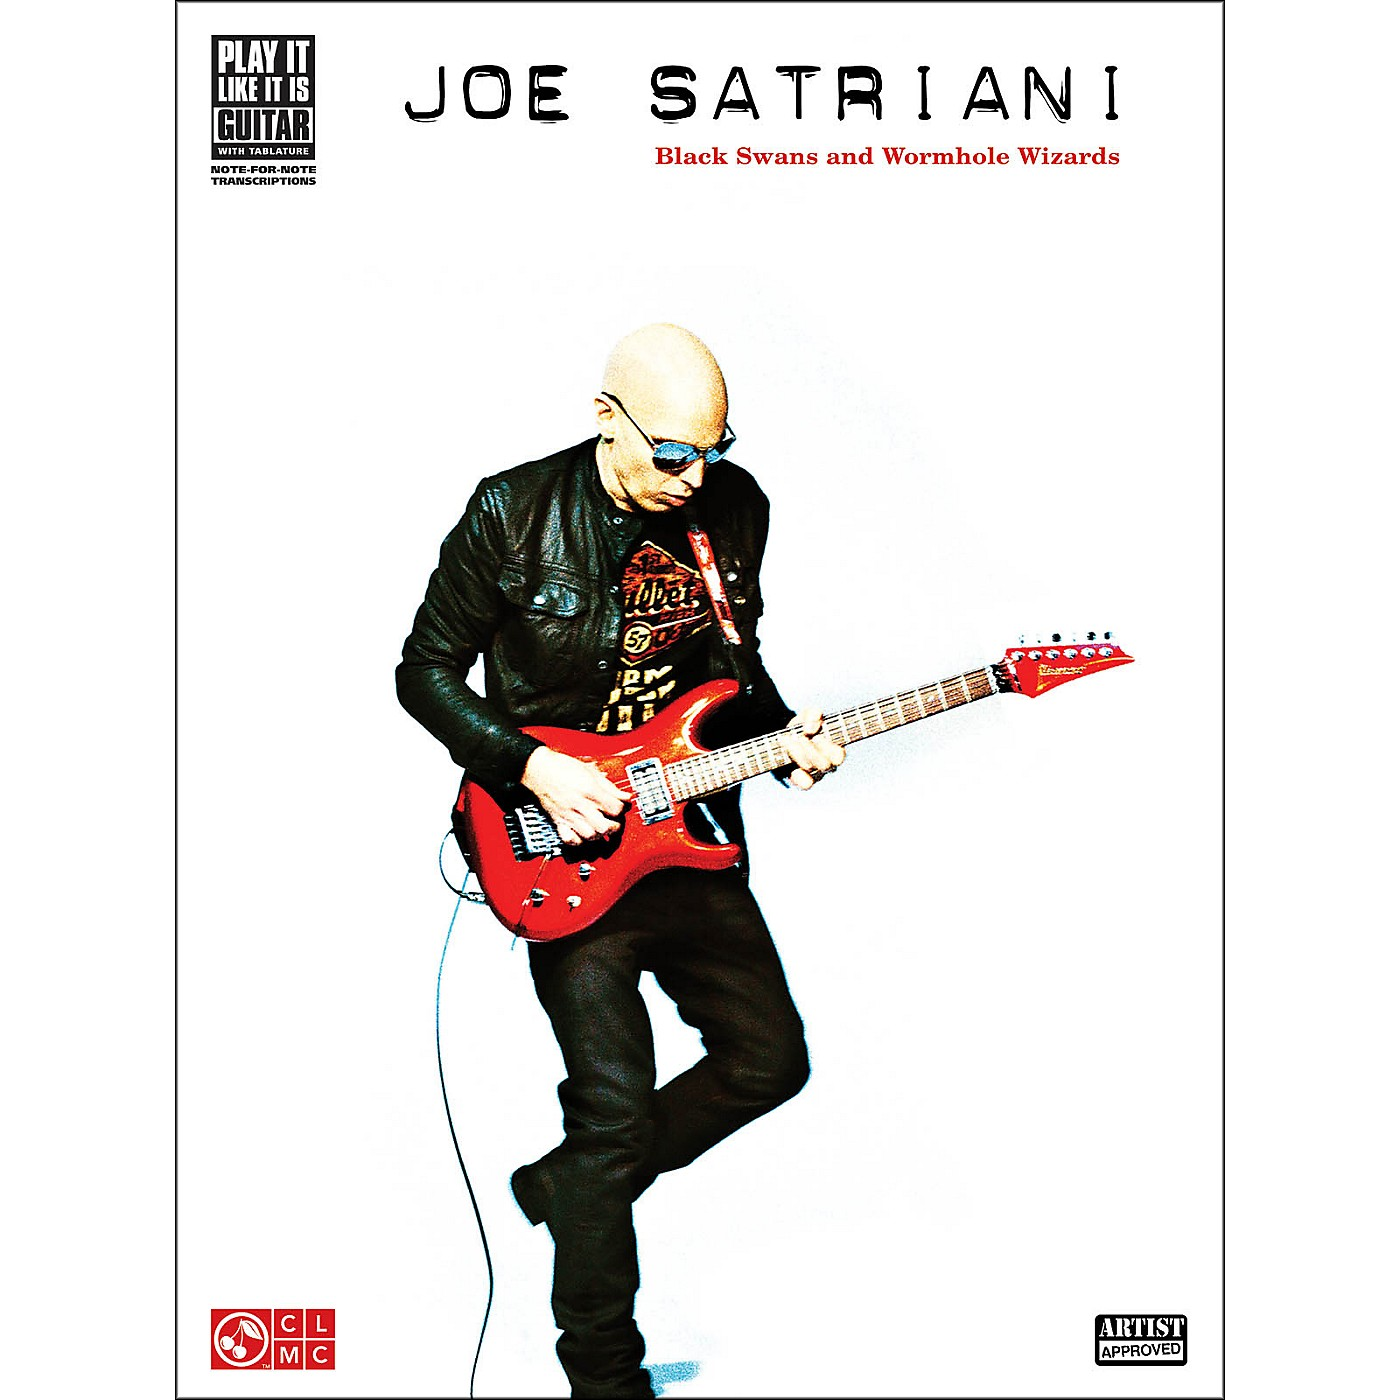 Hal Leonard Joe Satriani: Black Swans And Wormhole Wizards Guitar Tab Songbook thumbnail